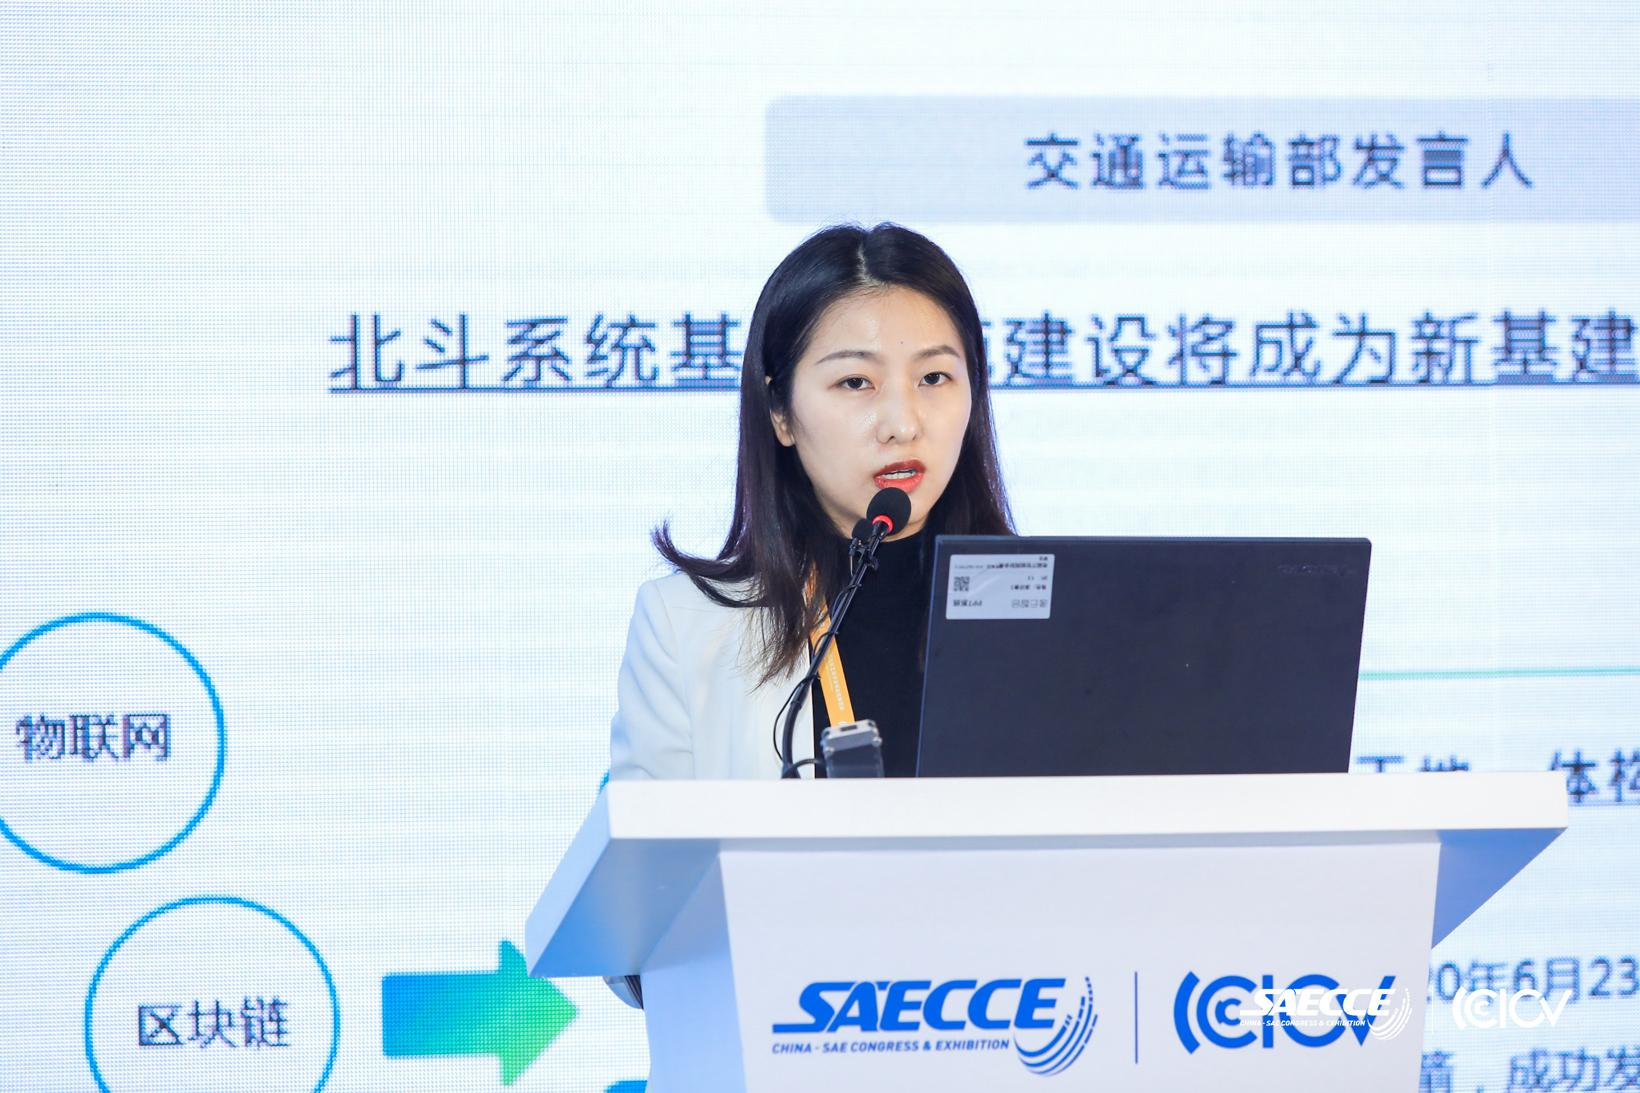 SAECCE 2020 | 中国移动陈楚瑶:5G+北斗高精度定位赋能新基建